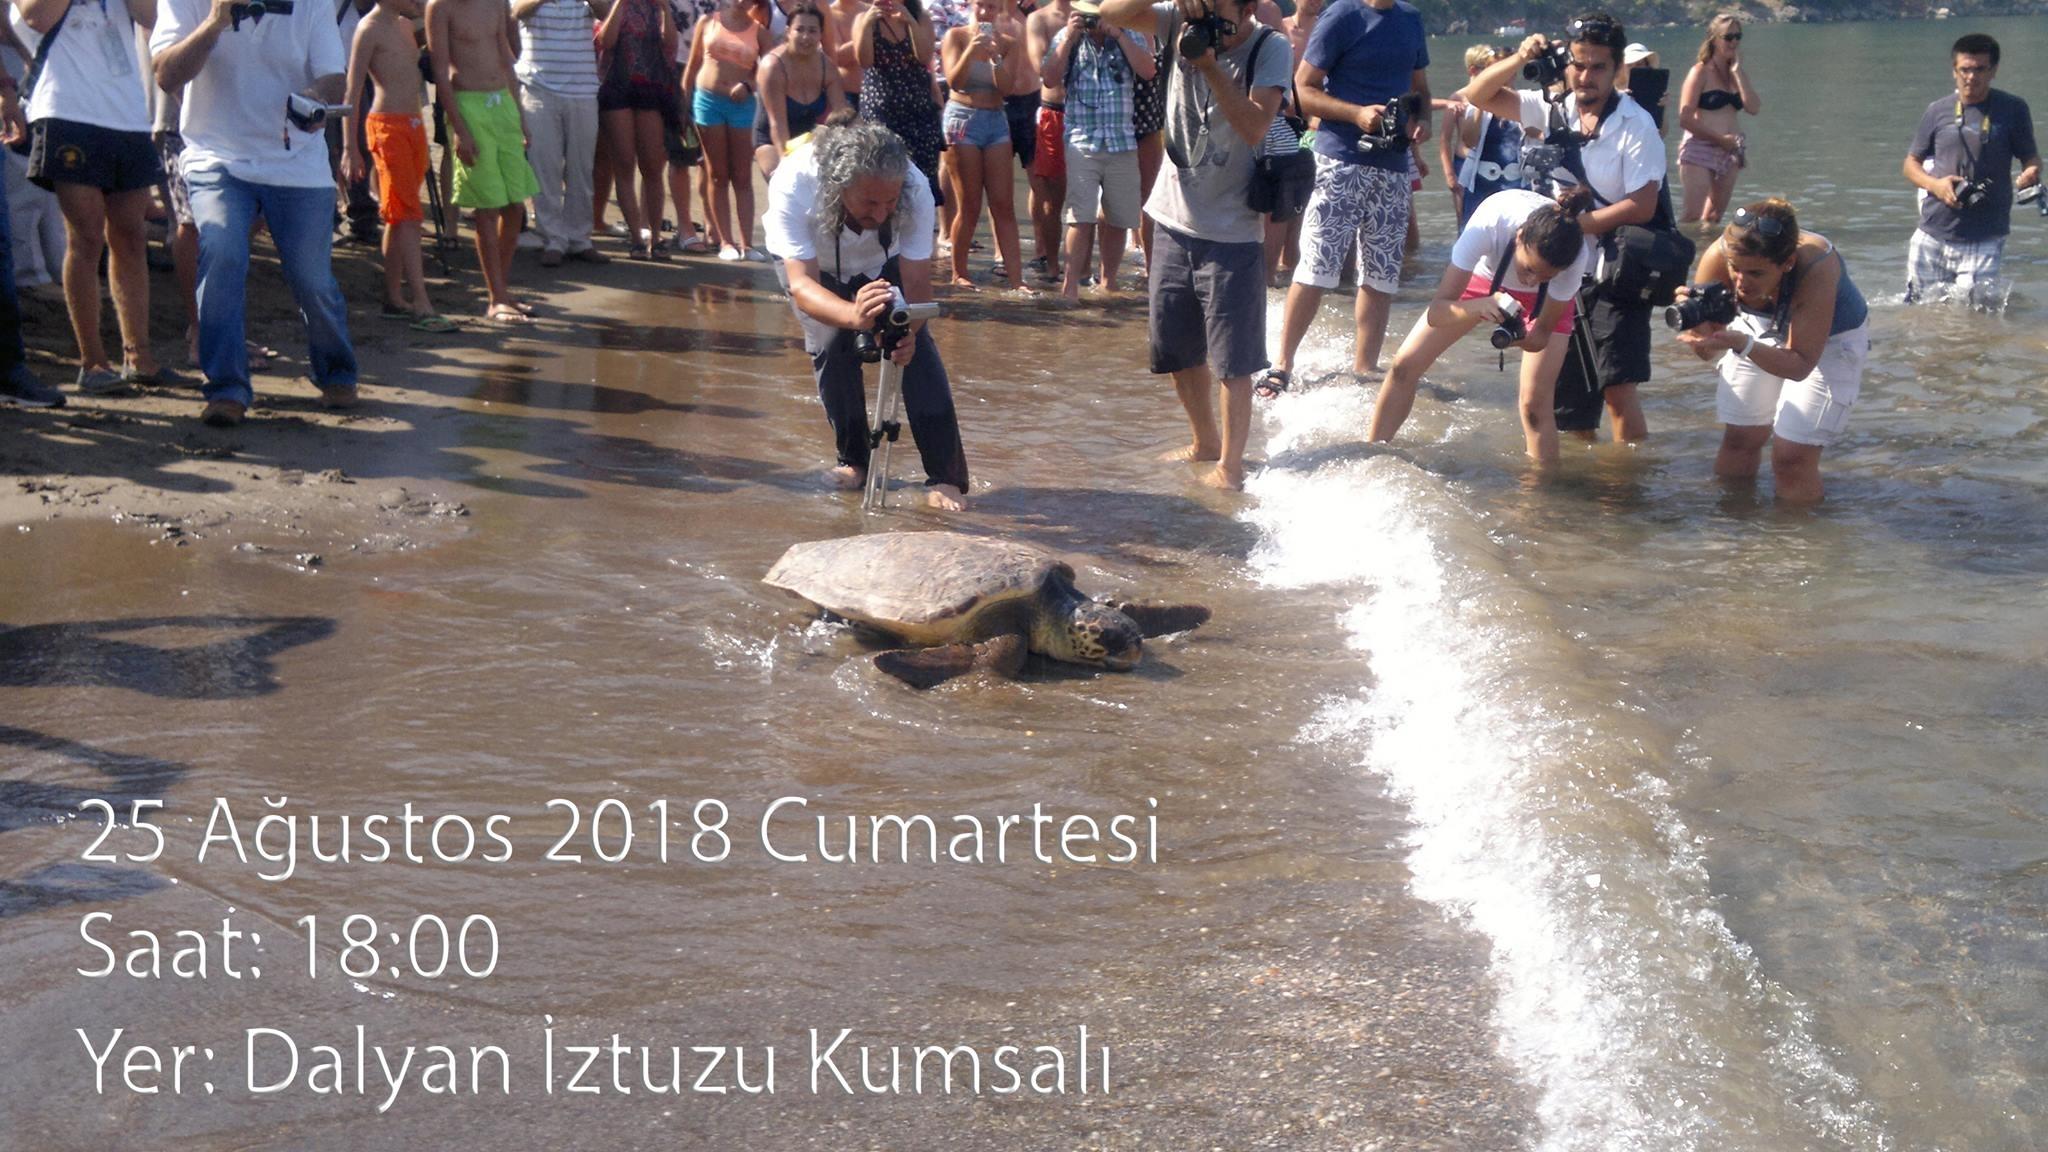 Turtle Beach event